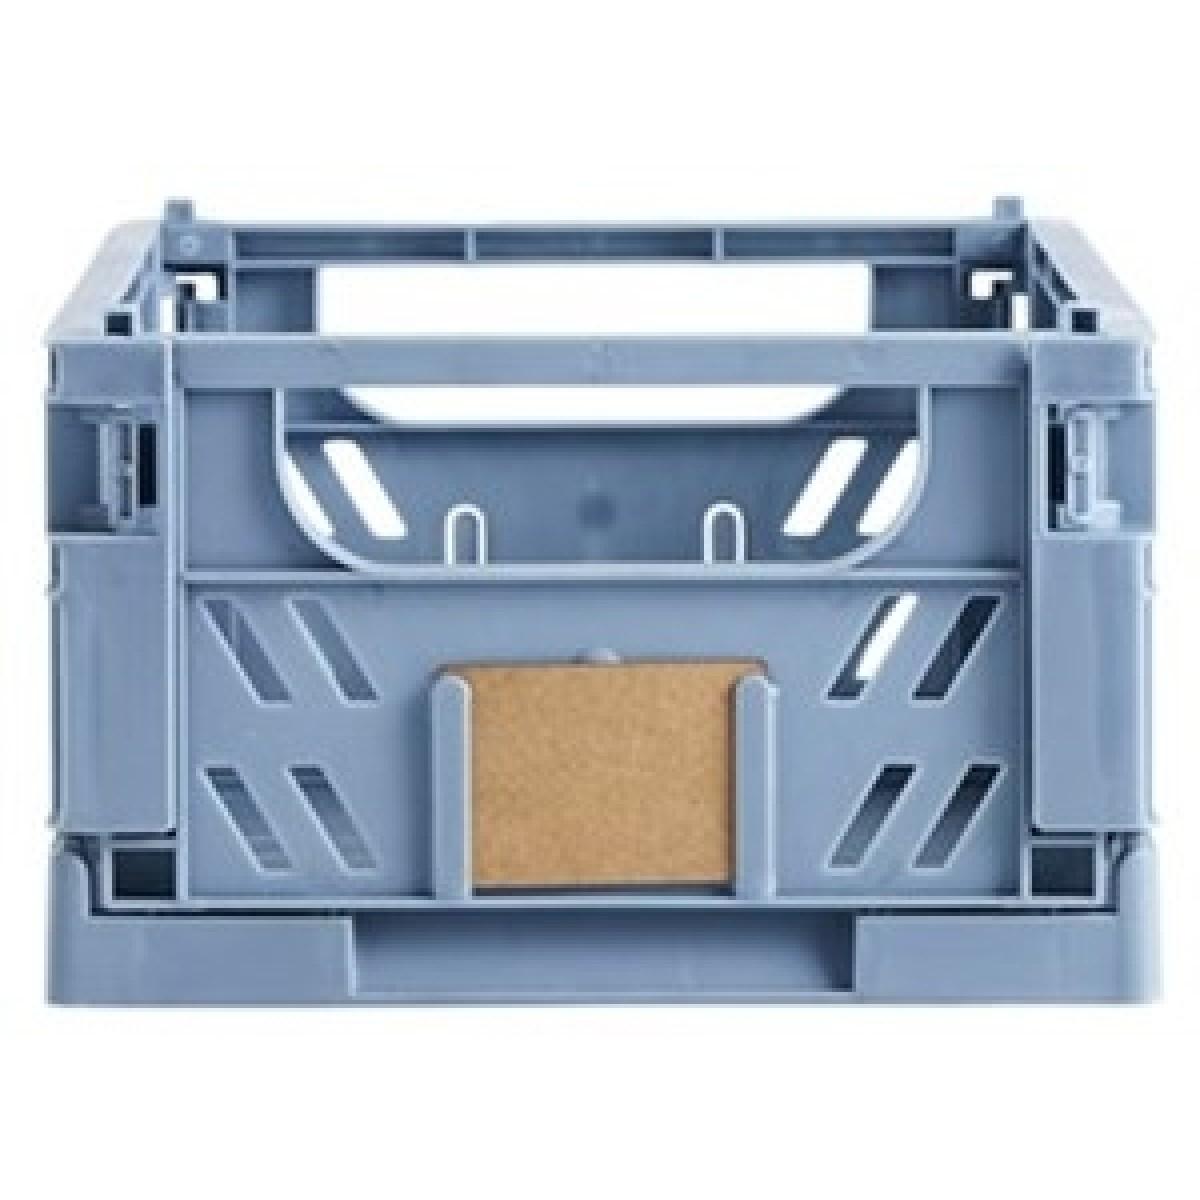 DAYOpbevaringskassefoldbar33x245x15cmlysbl-012